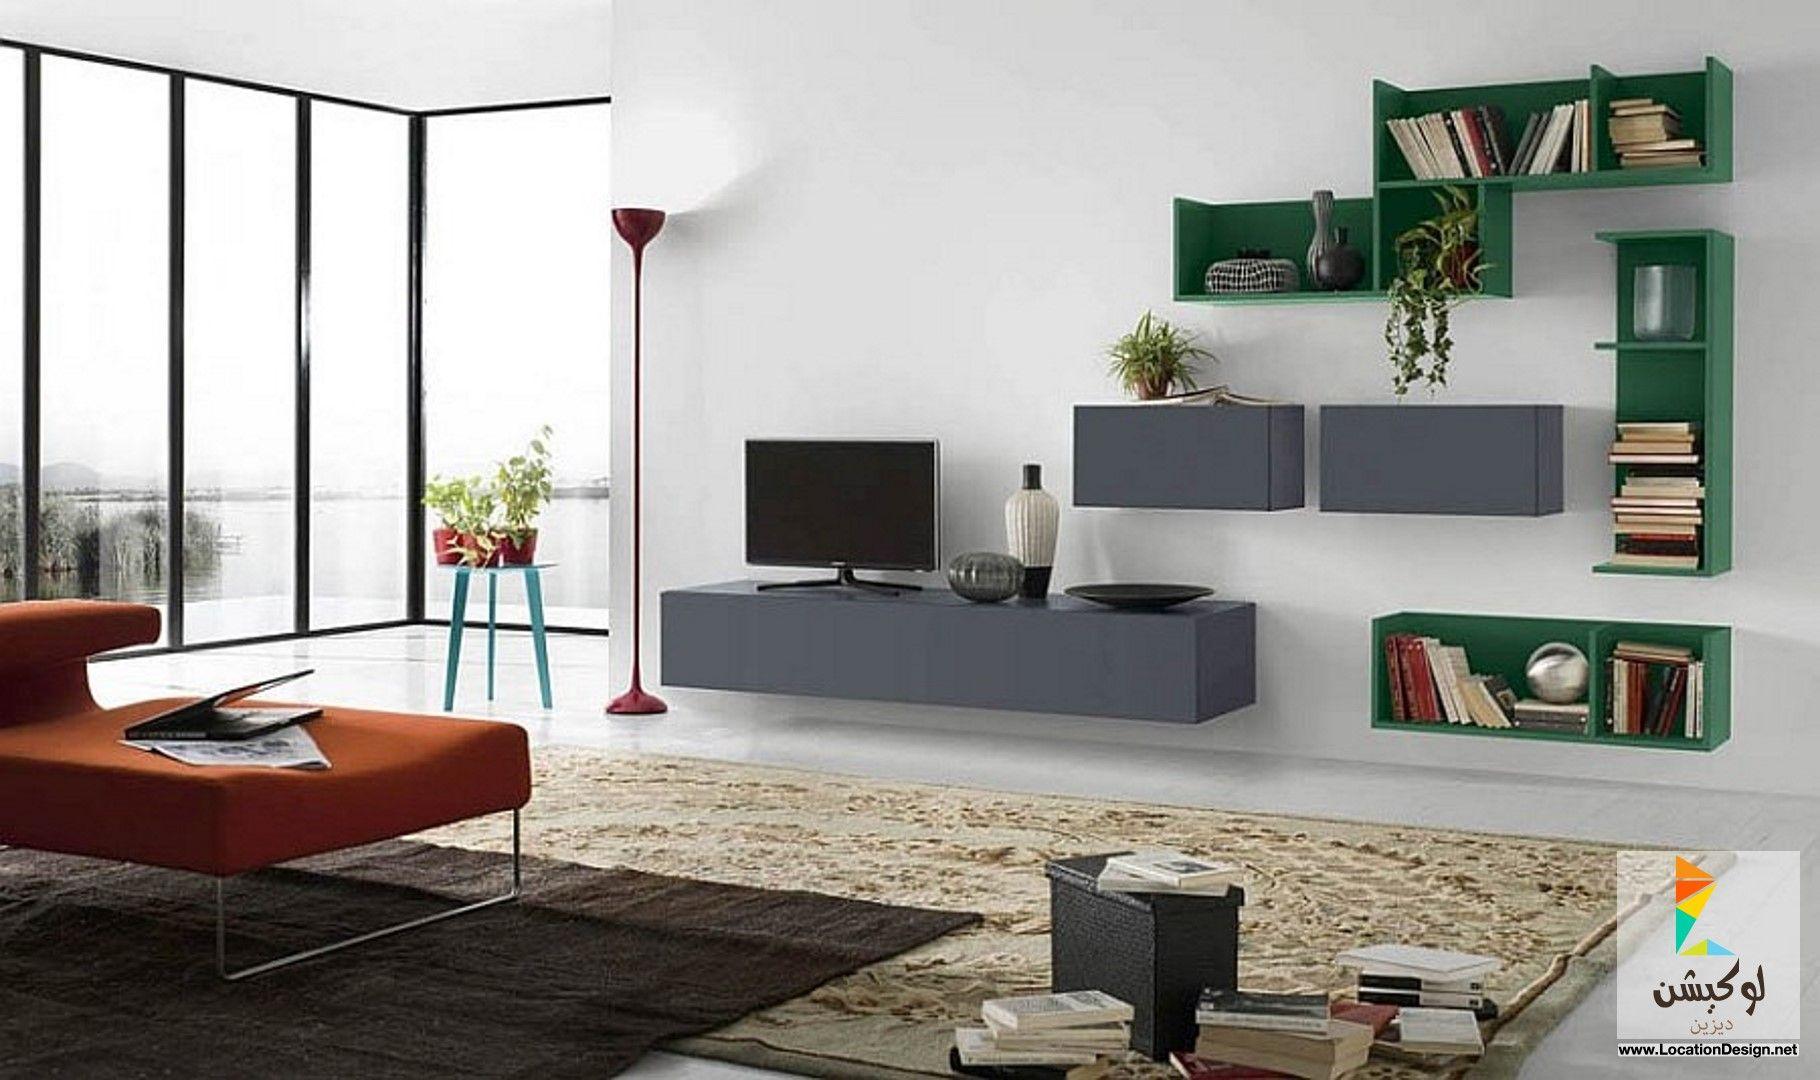 غرف معيشة بسيطة وجميلة Living Room Wall Units Living Room Furniture Wall Unit Designs